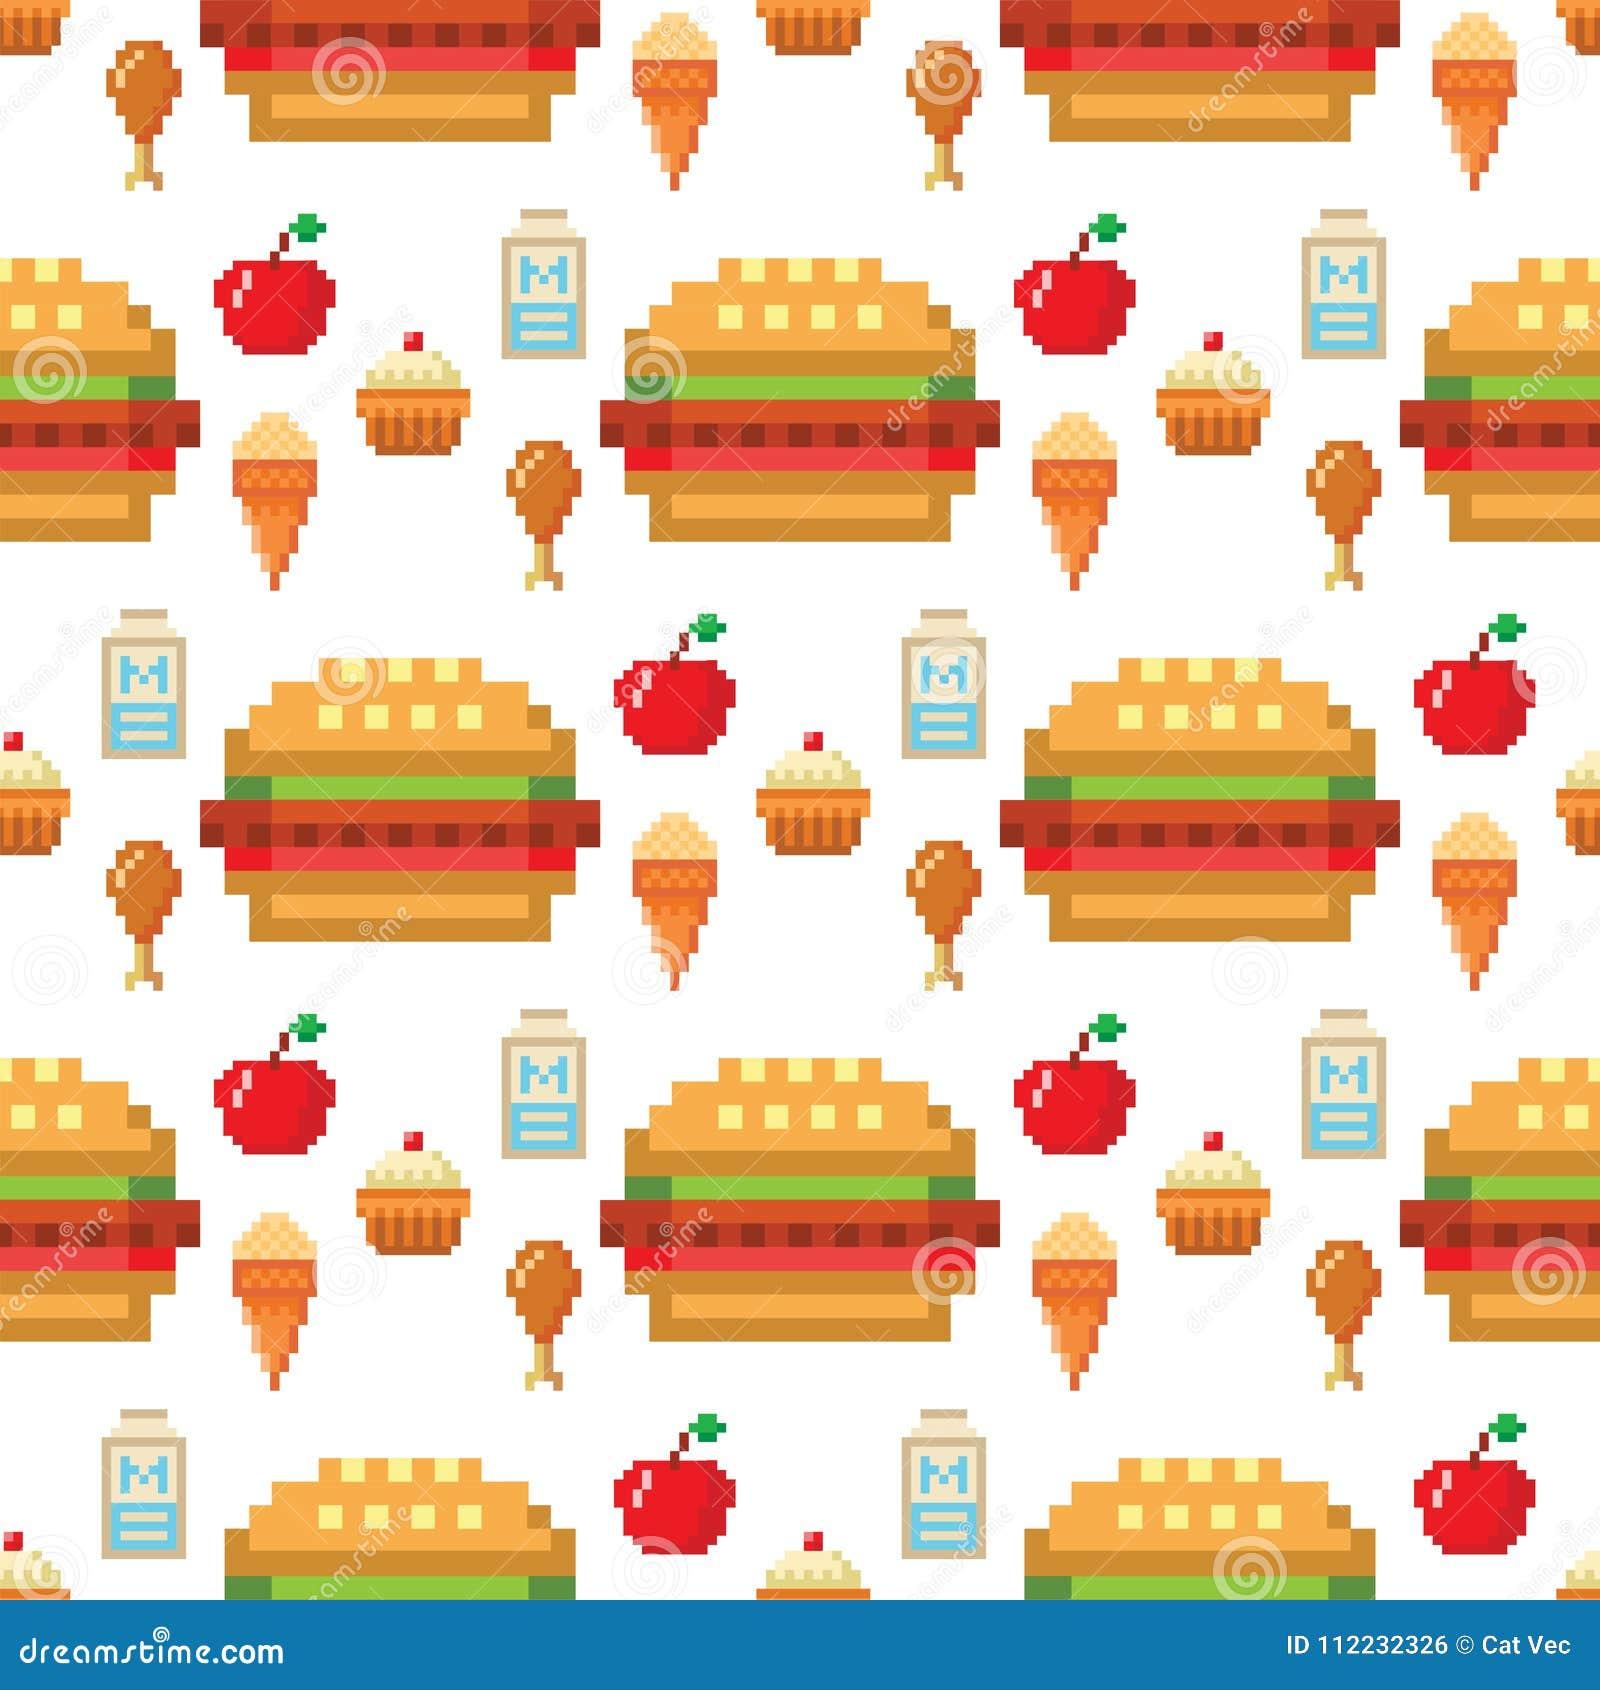 Pixel Art Food Computer Design Seamless Pattern Background Vector Illustration Restaurant Pixelated Element Fast Food Stock Vector Illustration Of Healthy Pear 112232326